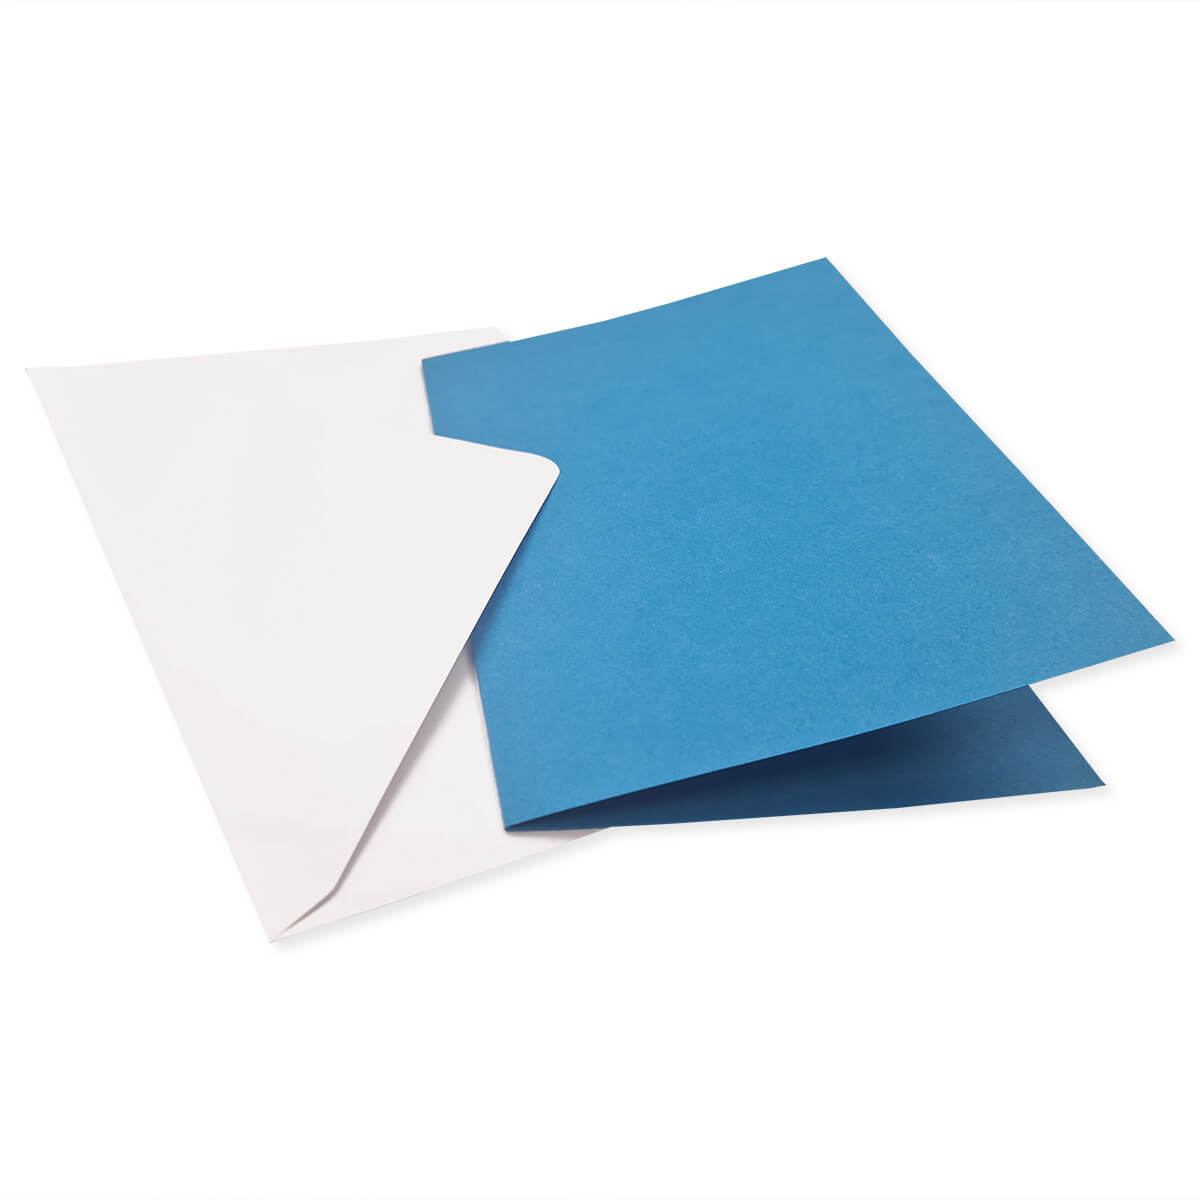 A6 DEEP BLUE CARD BLANKS & WHITE ENVELOPES (PACK OF 10)